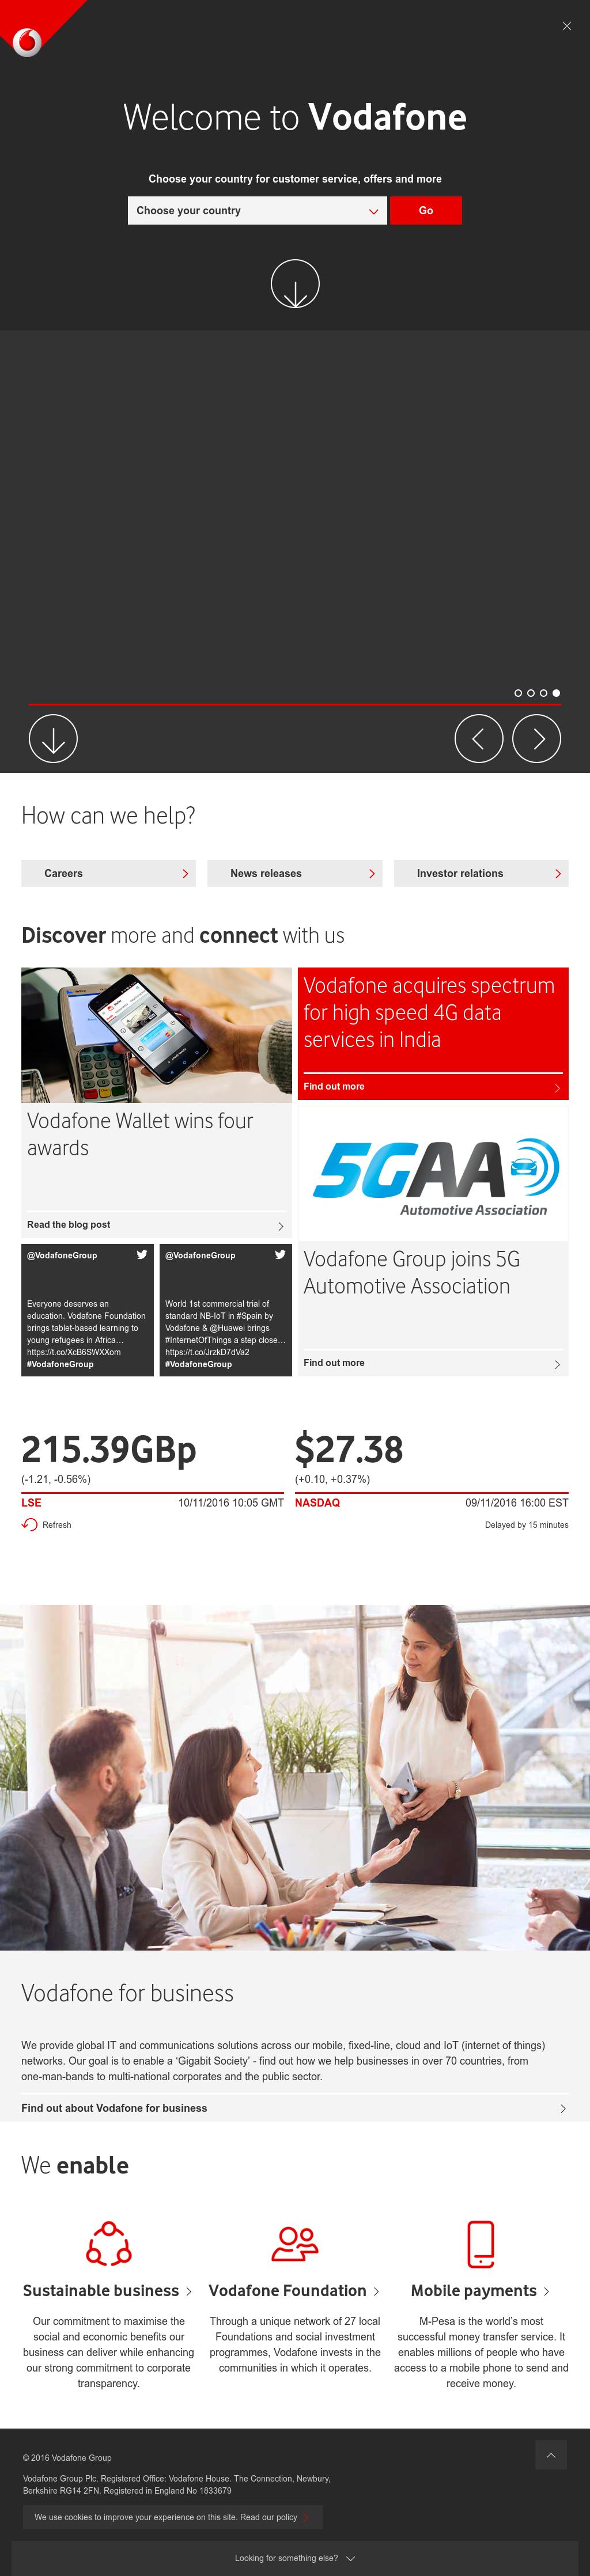 vodafone competitors analysis